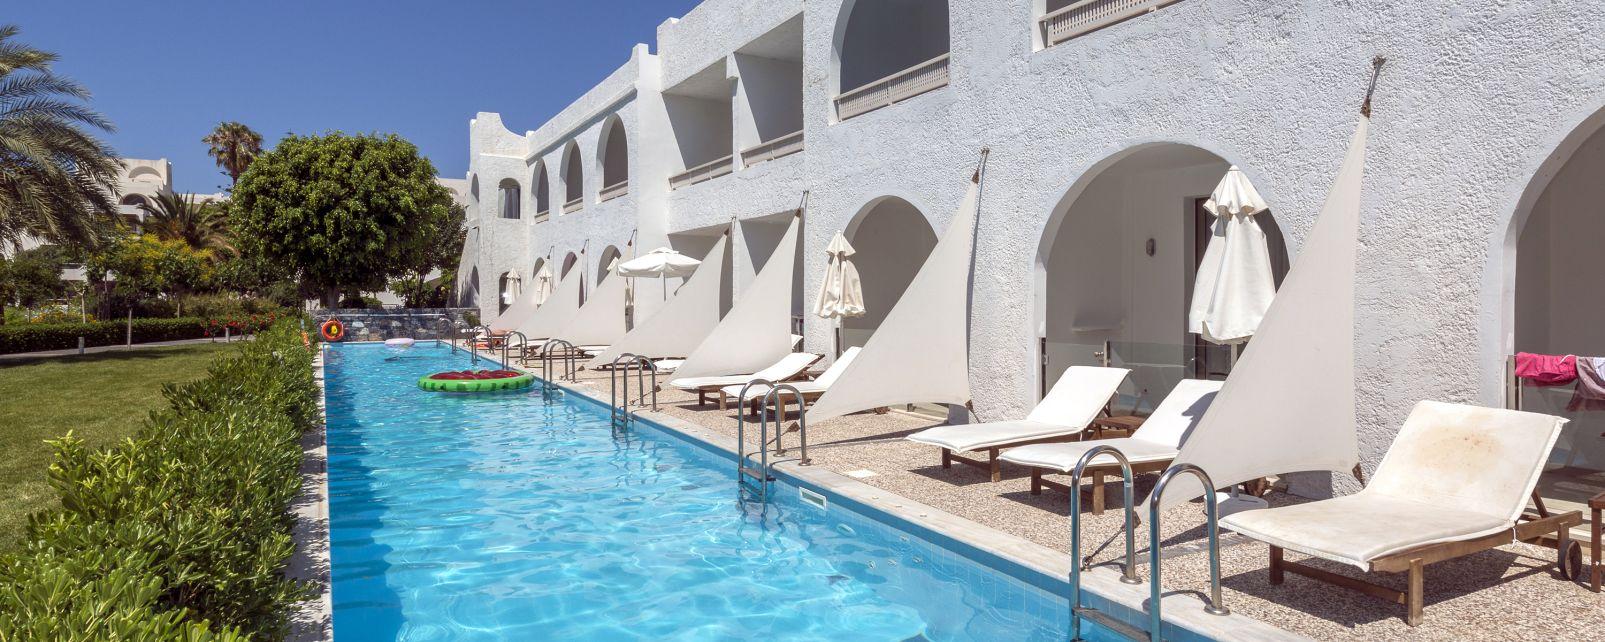 Hotel Marmara Beach Crete